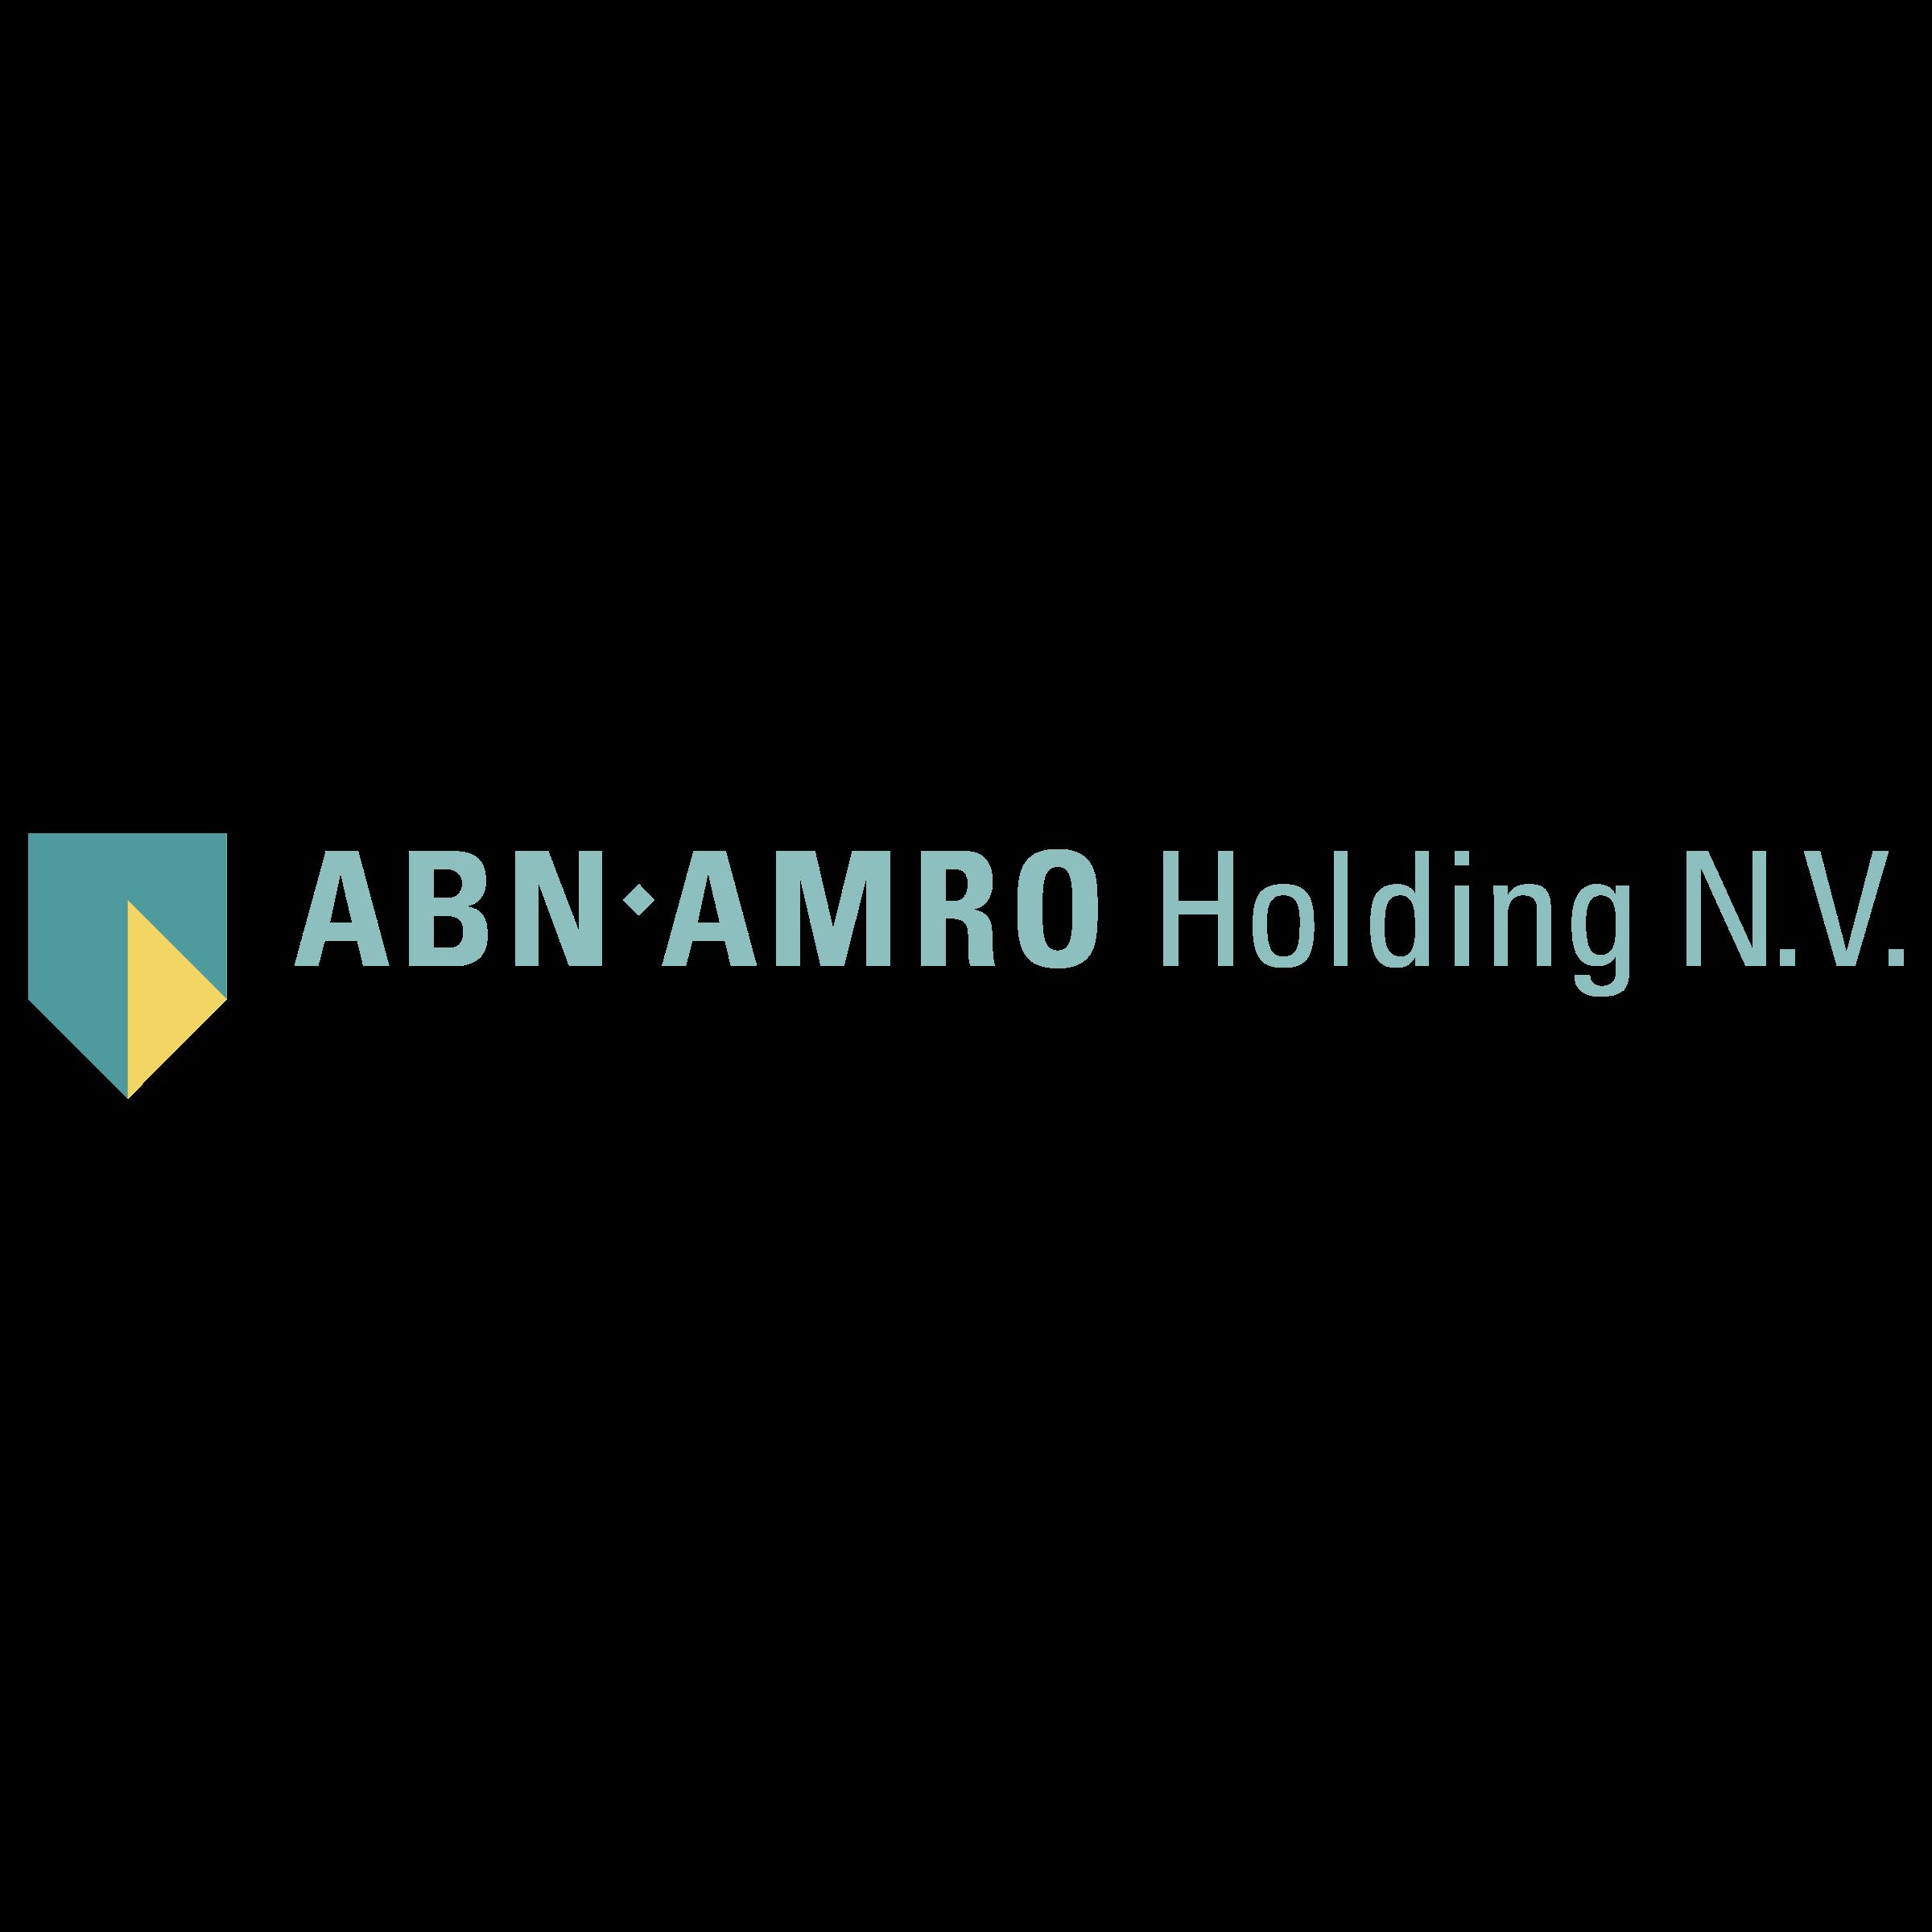 ABN AMRO Holding Logo PNG Transparent & SVG Vector.